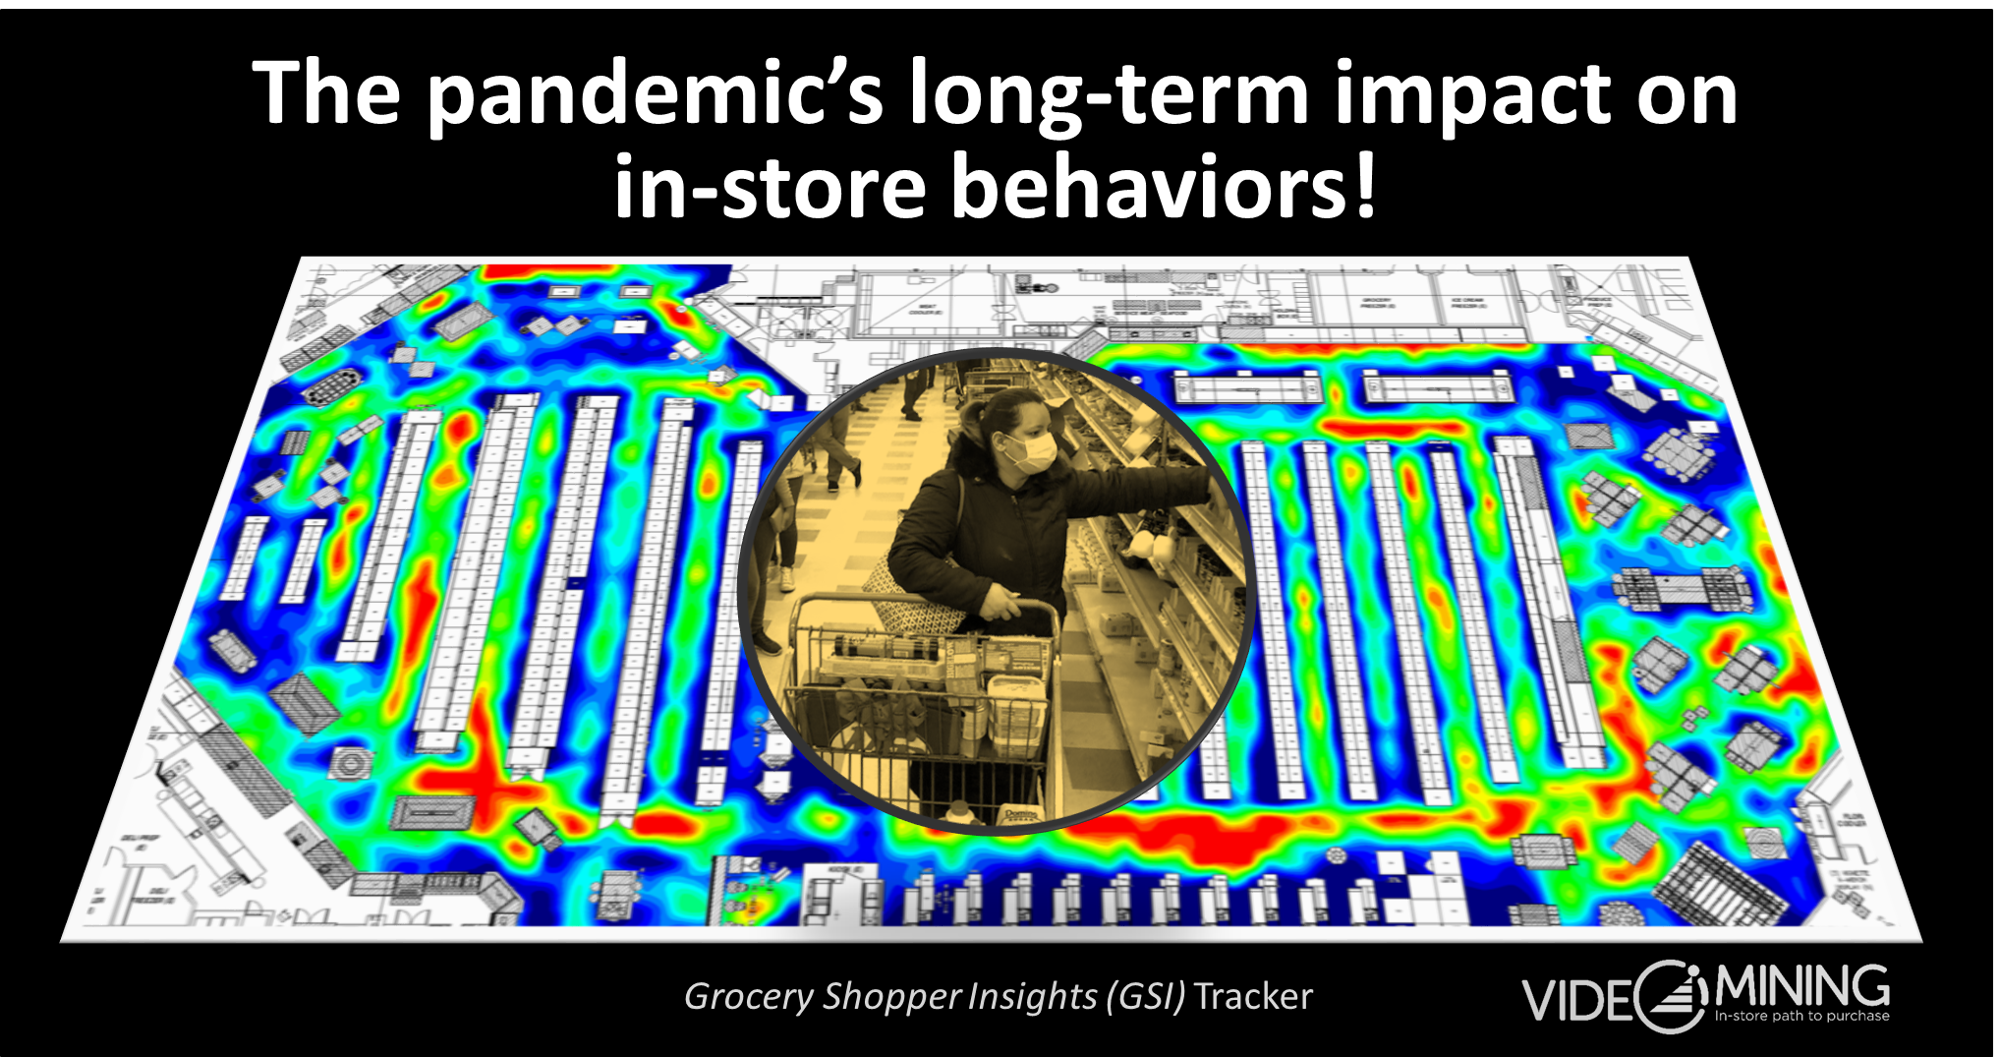 Pandemic's impact on shopper behaviors